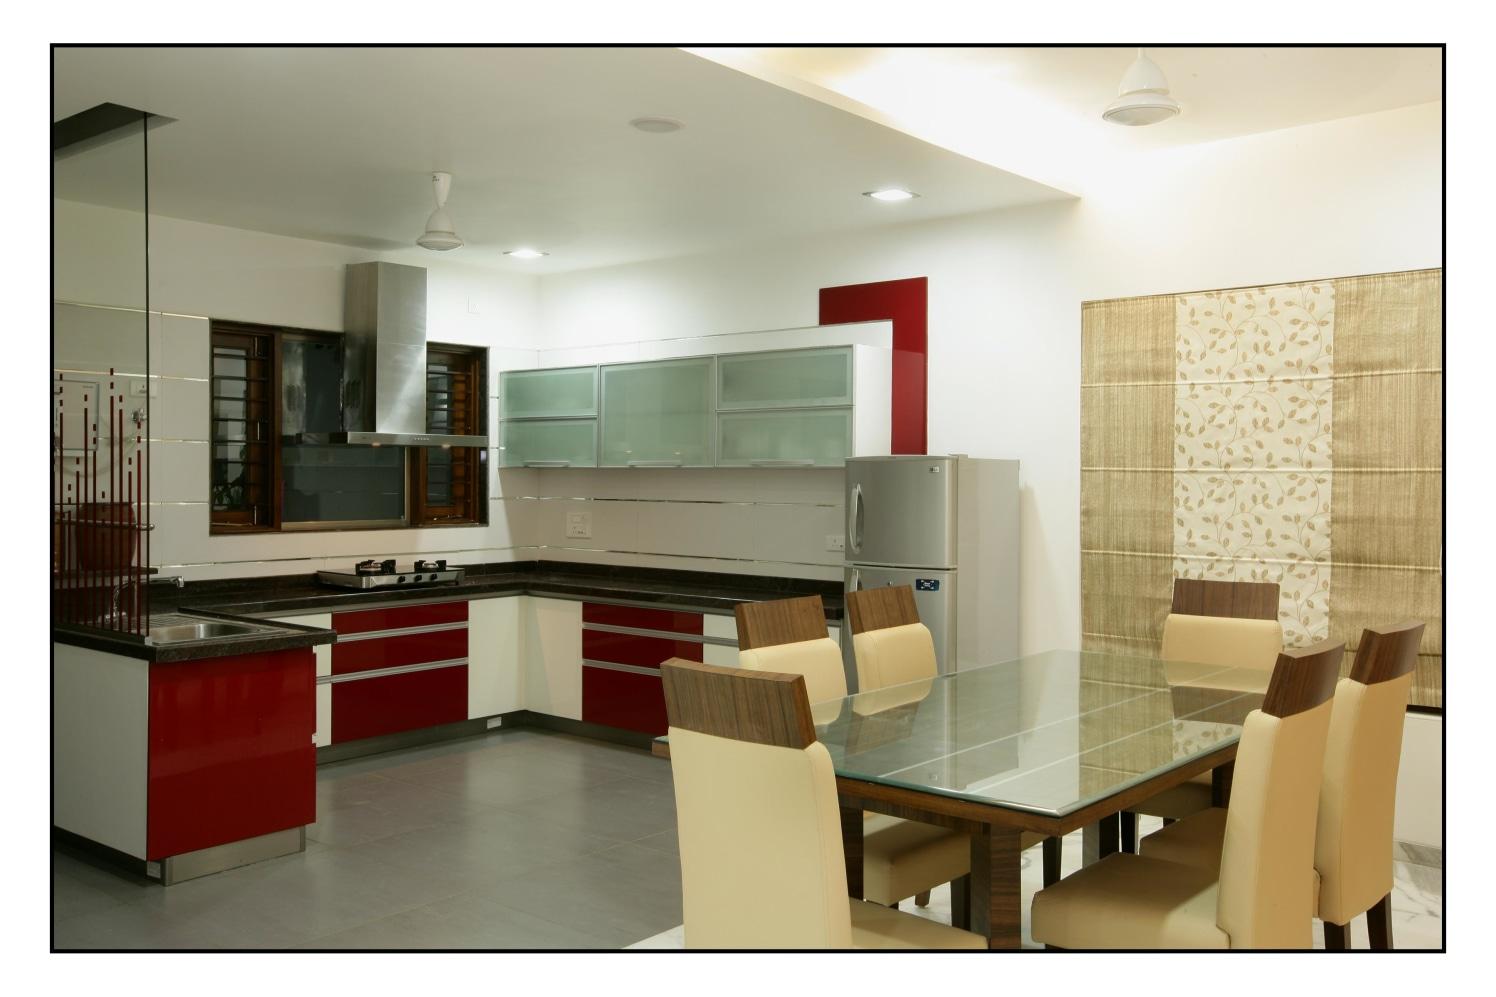 Go Deep with Red by RS Design Modular-kitchen Modern | Interior Design Photos & Ideas